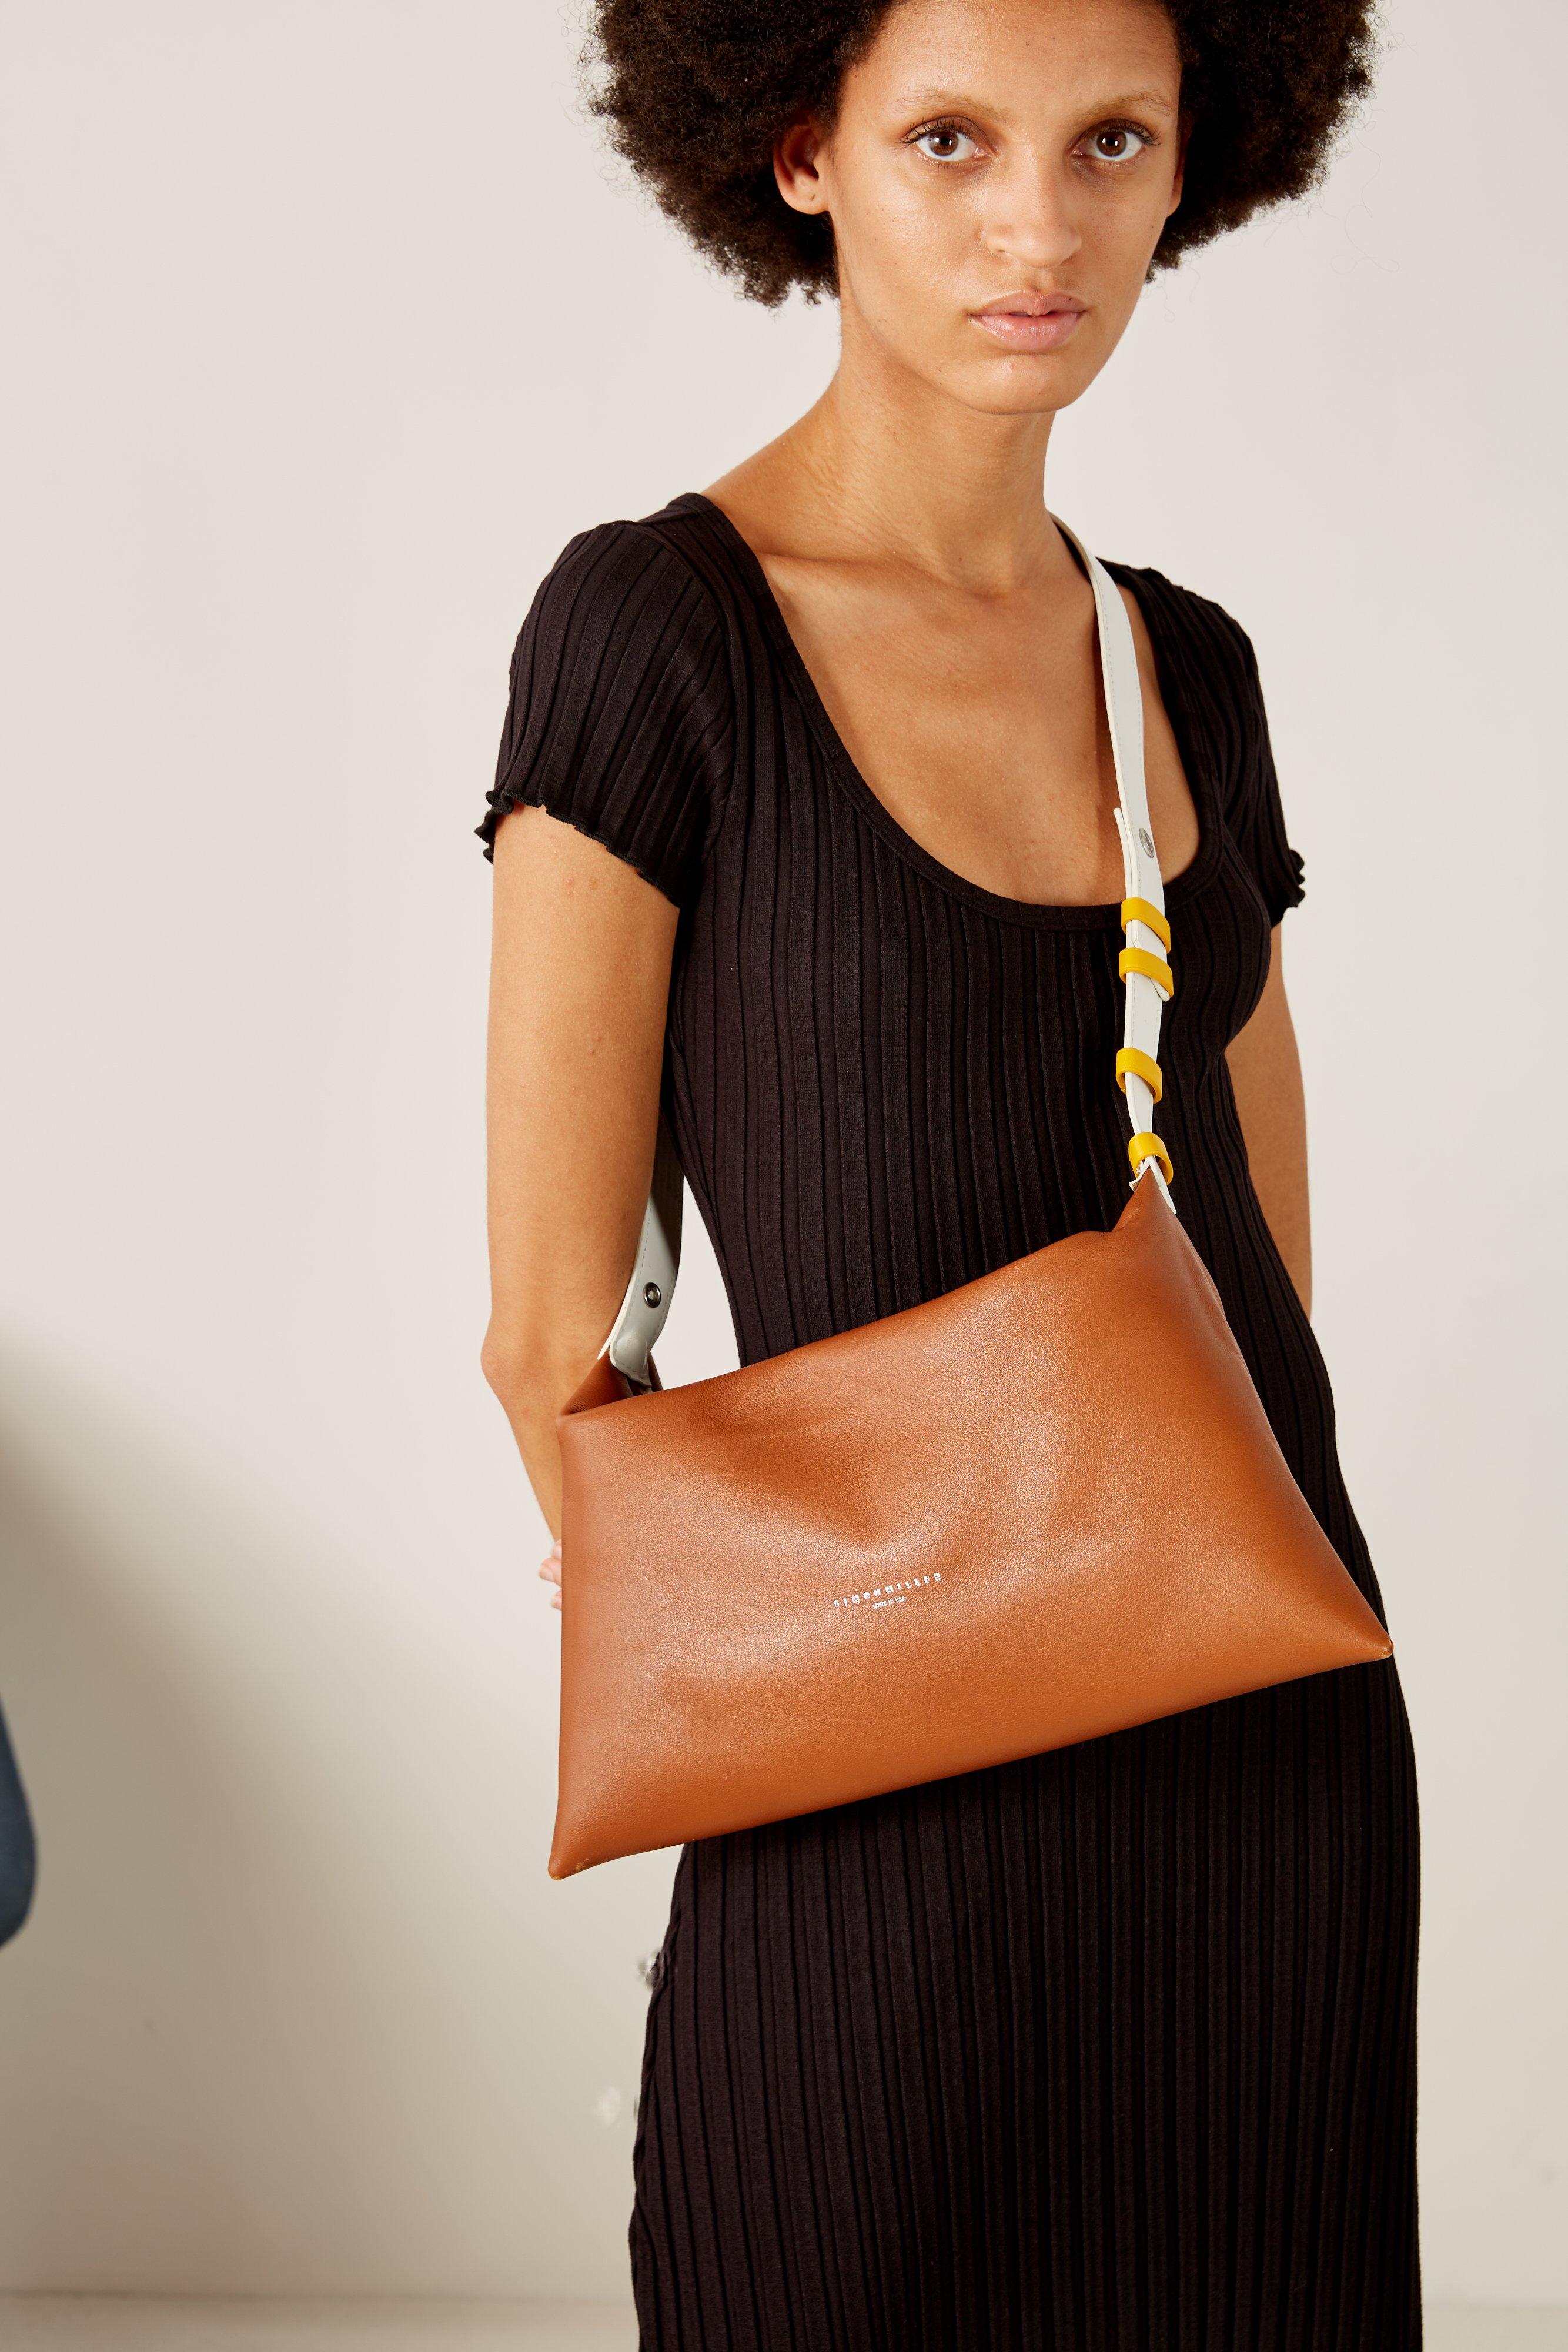 Puffin Bag in Tan Multi by Simon Miller - 3